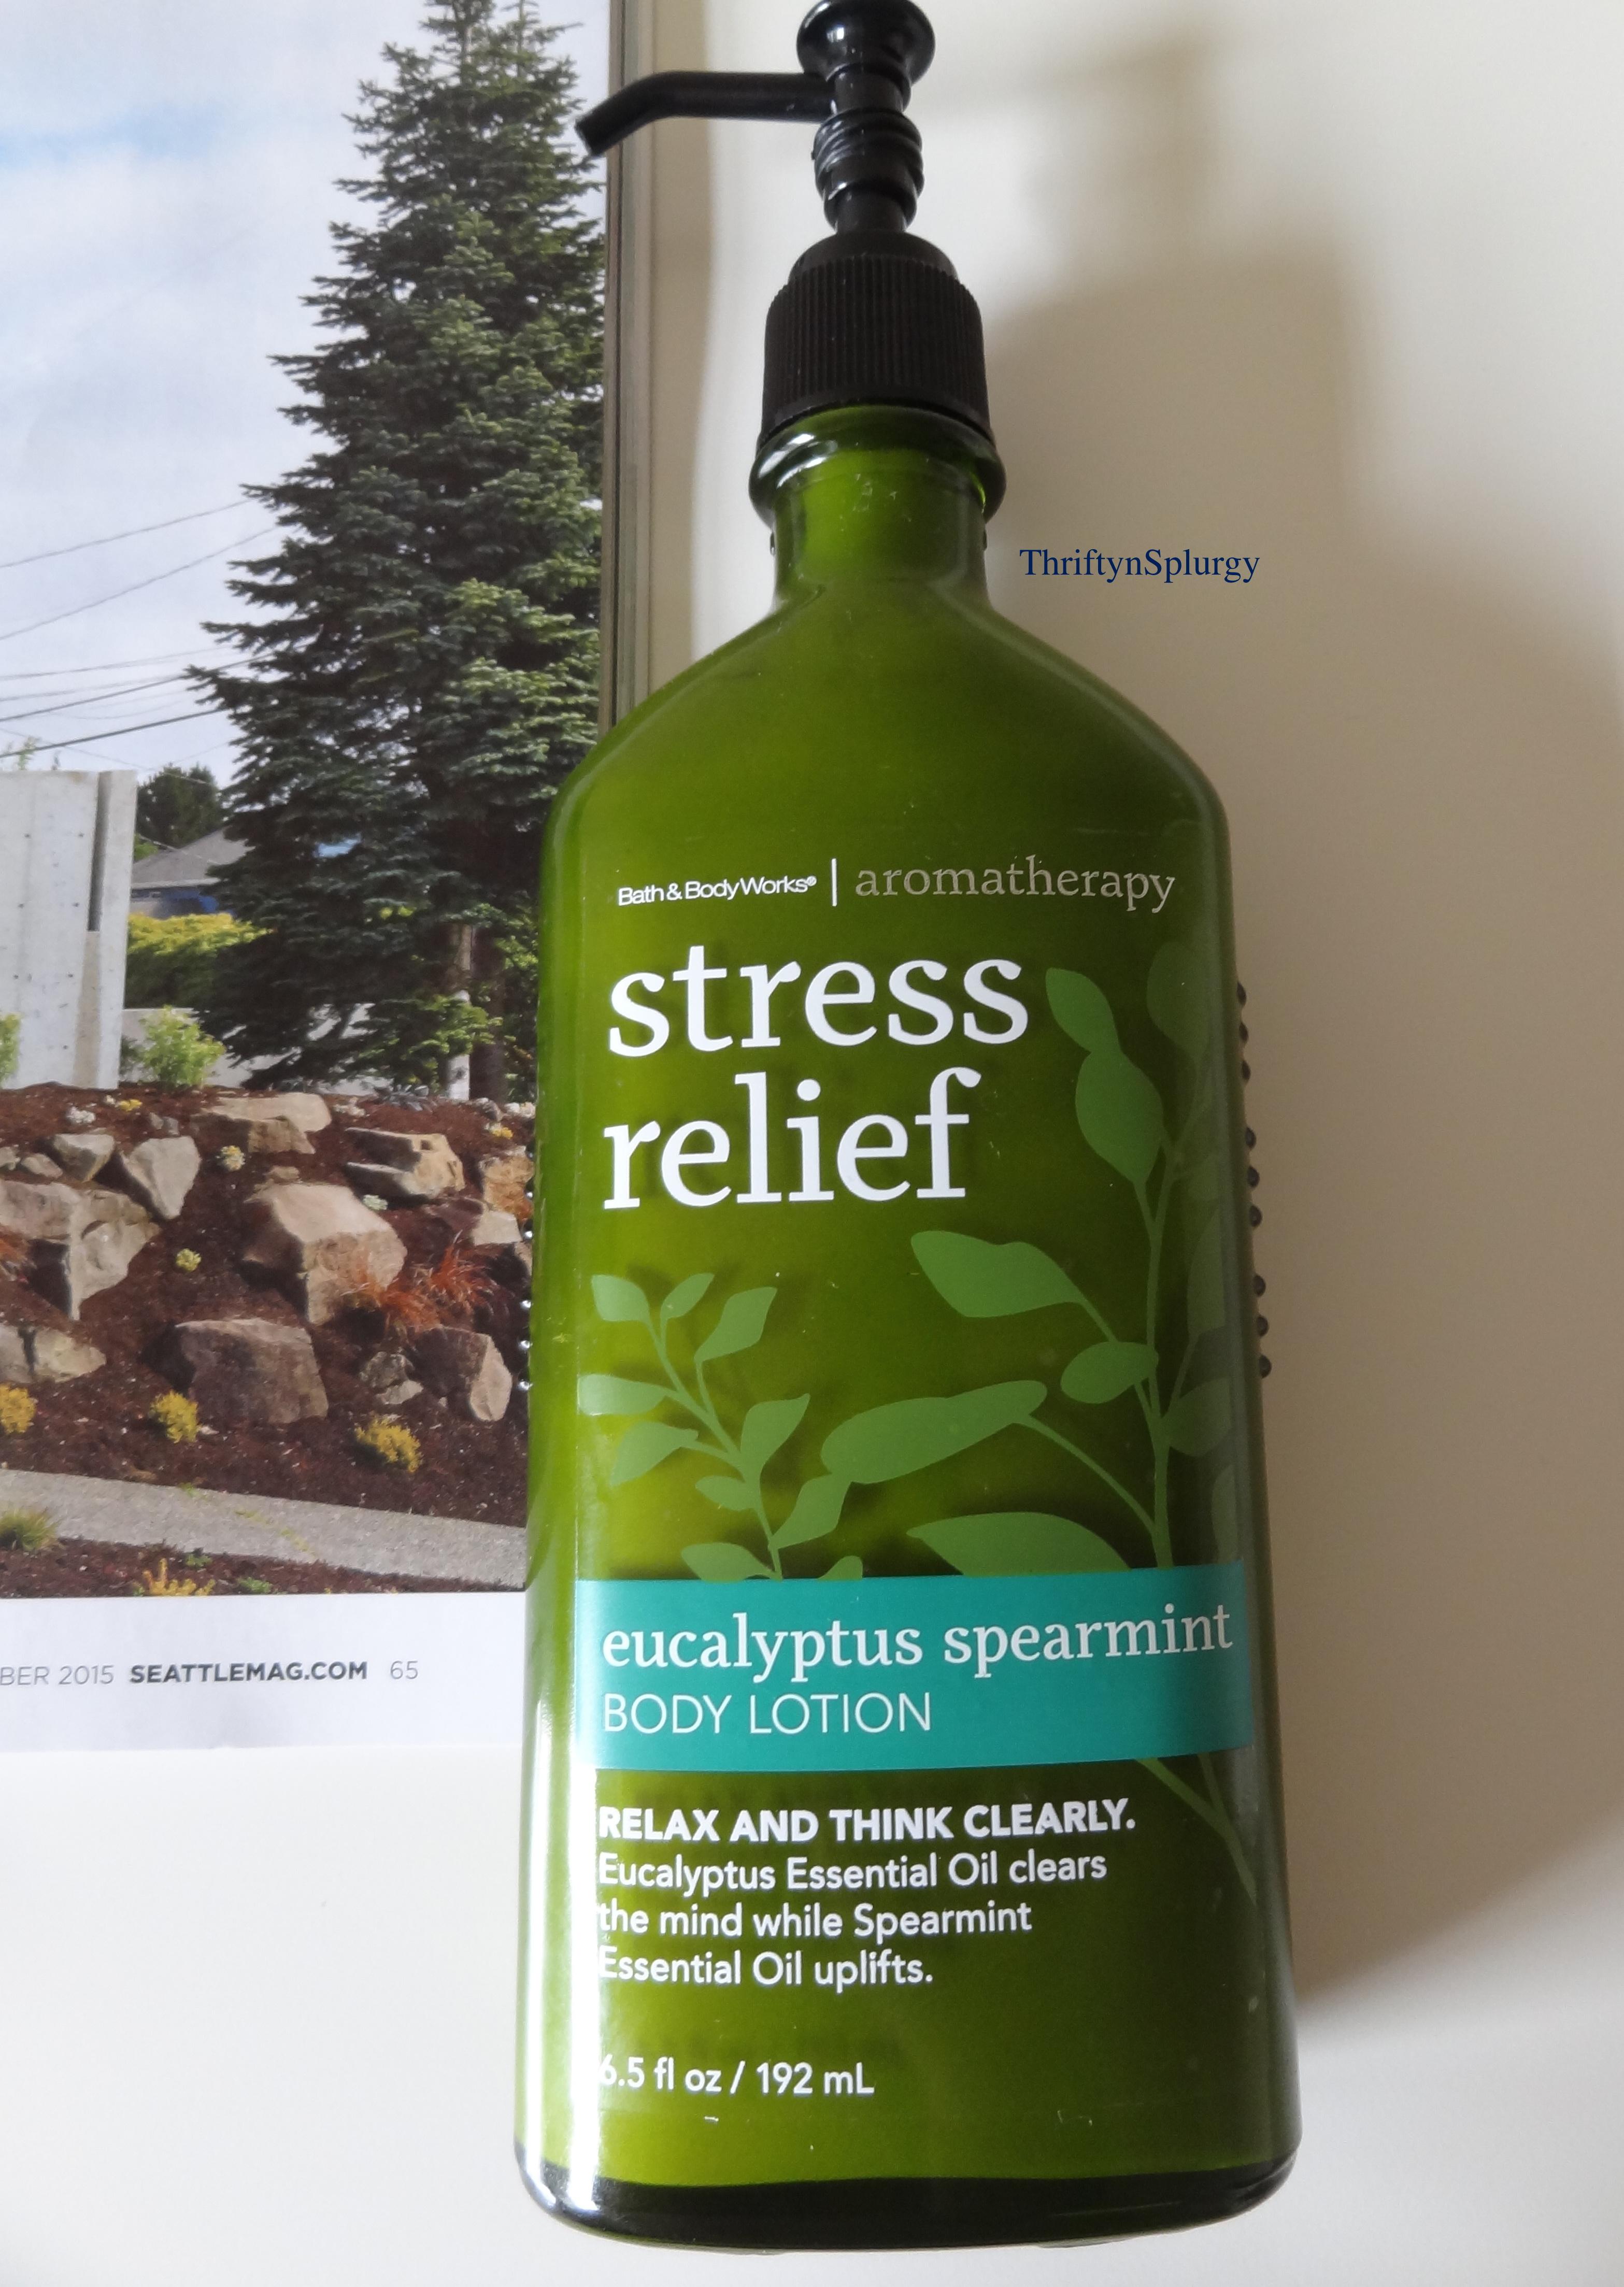 Aromatherapy Body Lotion Eucalyptus Spearmintbath Body Works